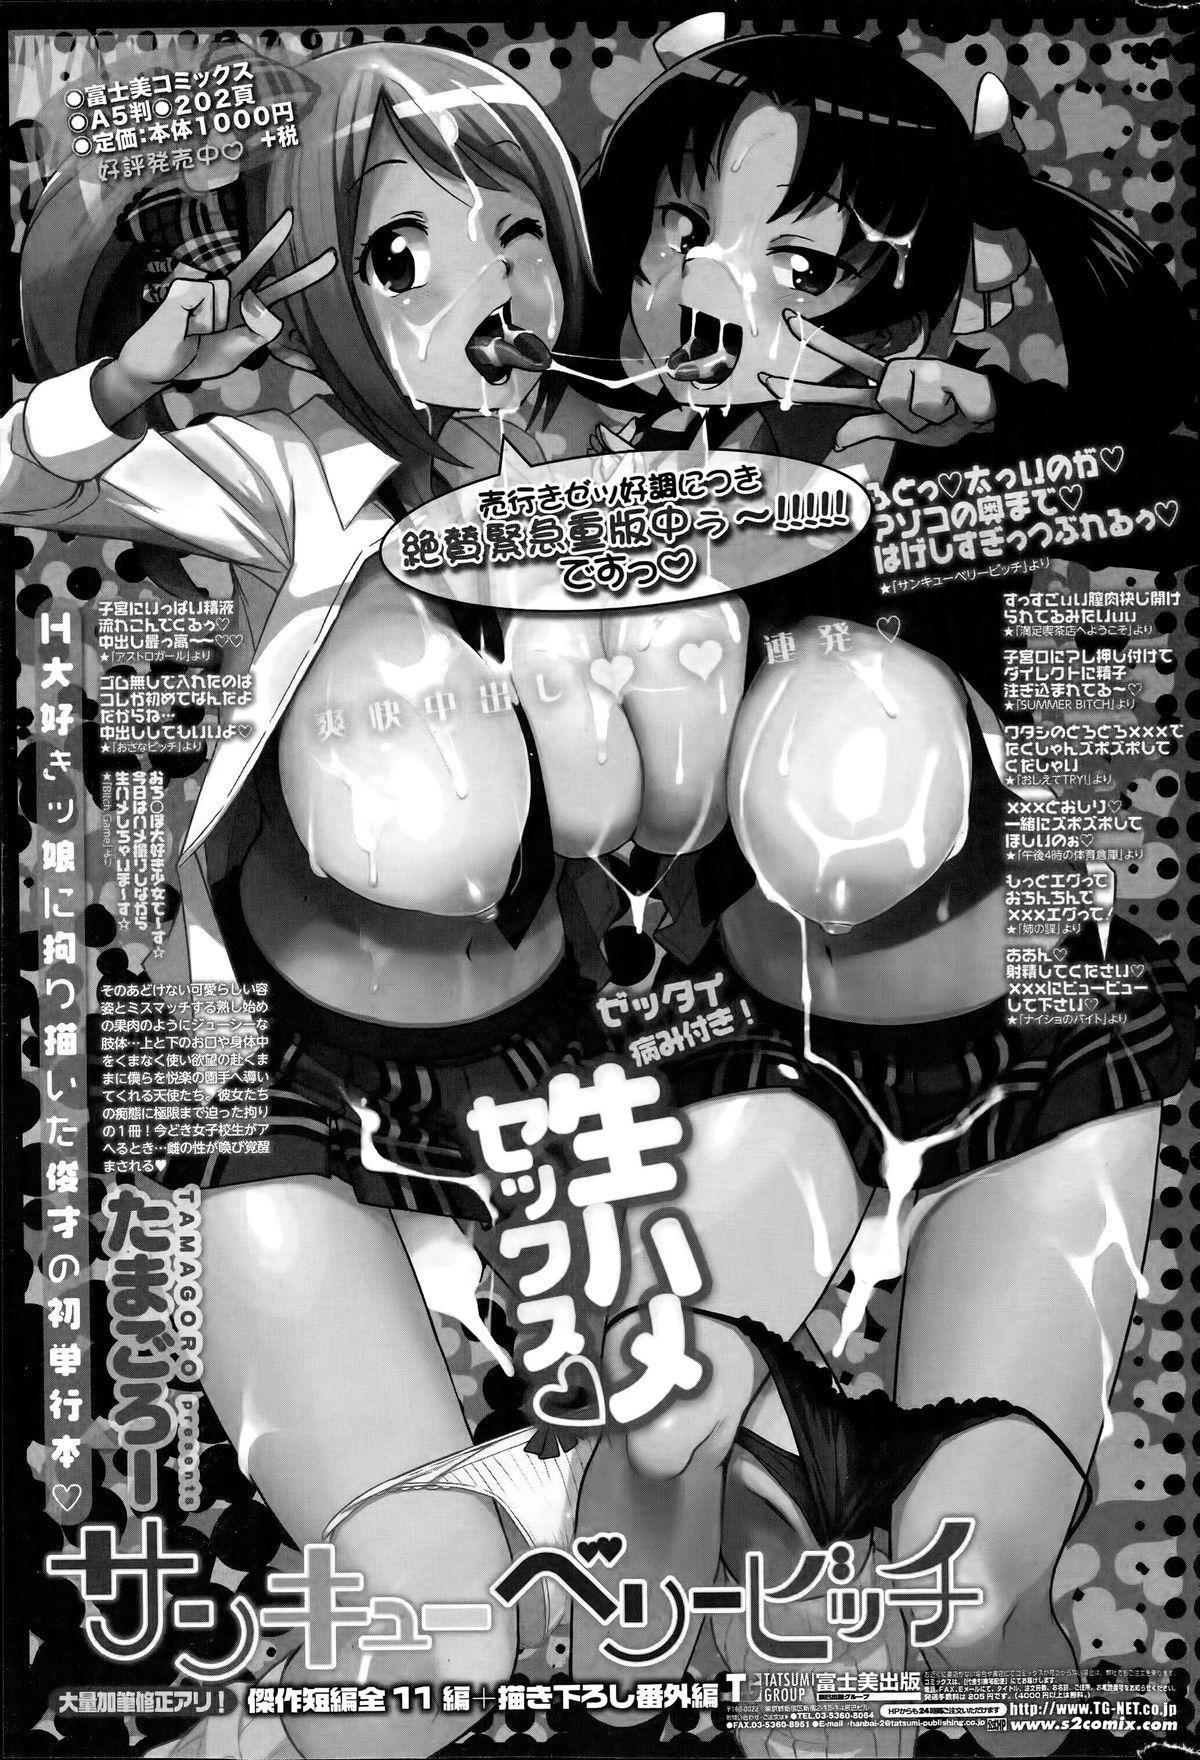 COMIC Penguin Club Sanzokuban 2014-06 54